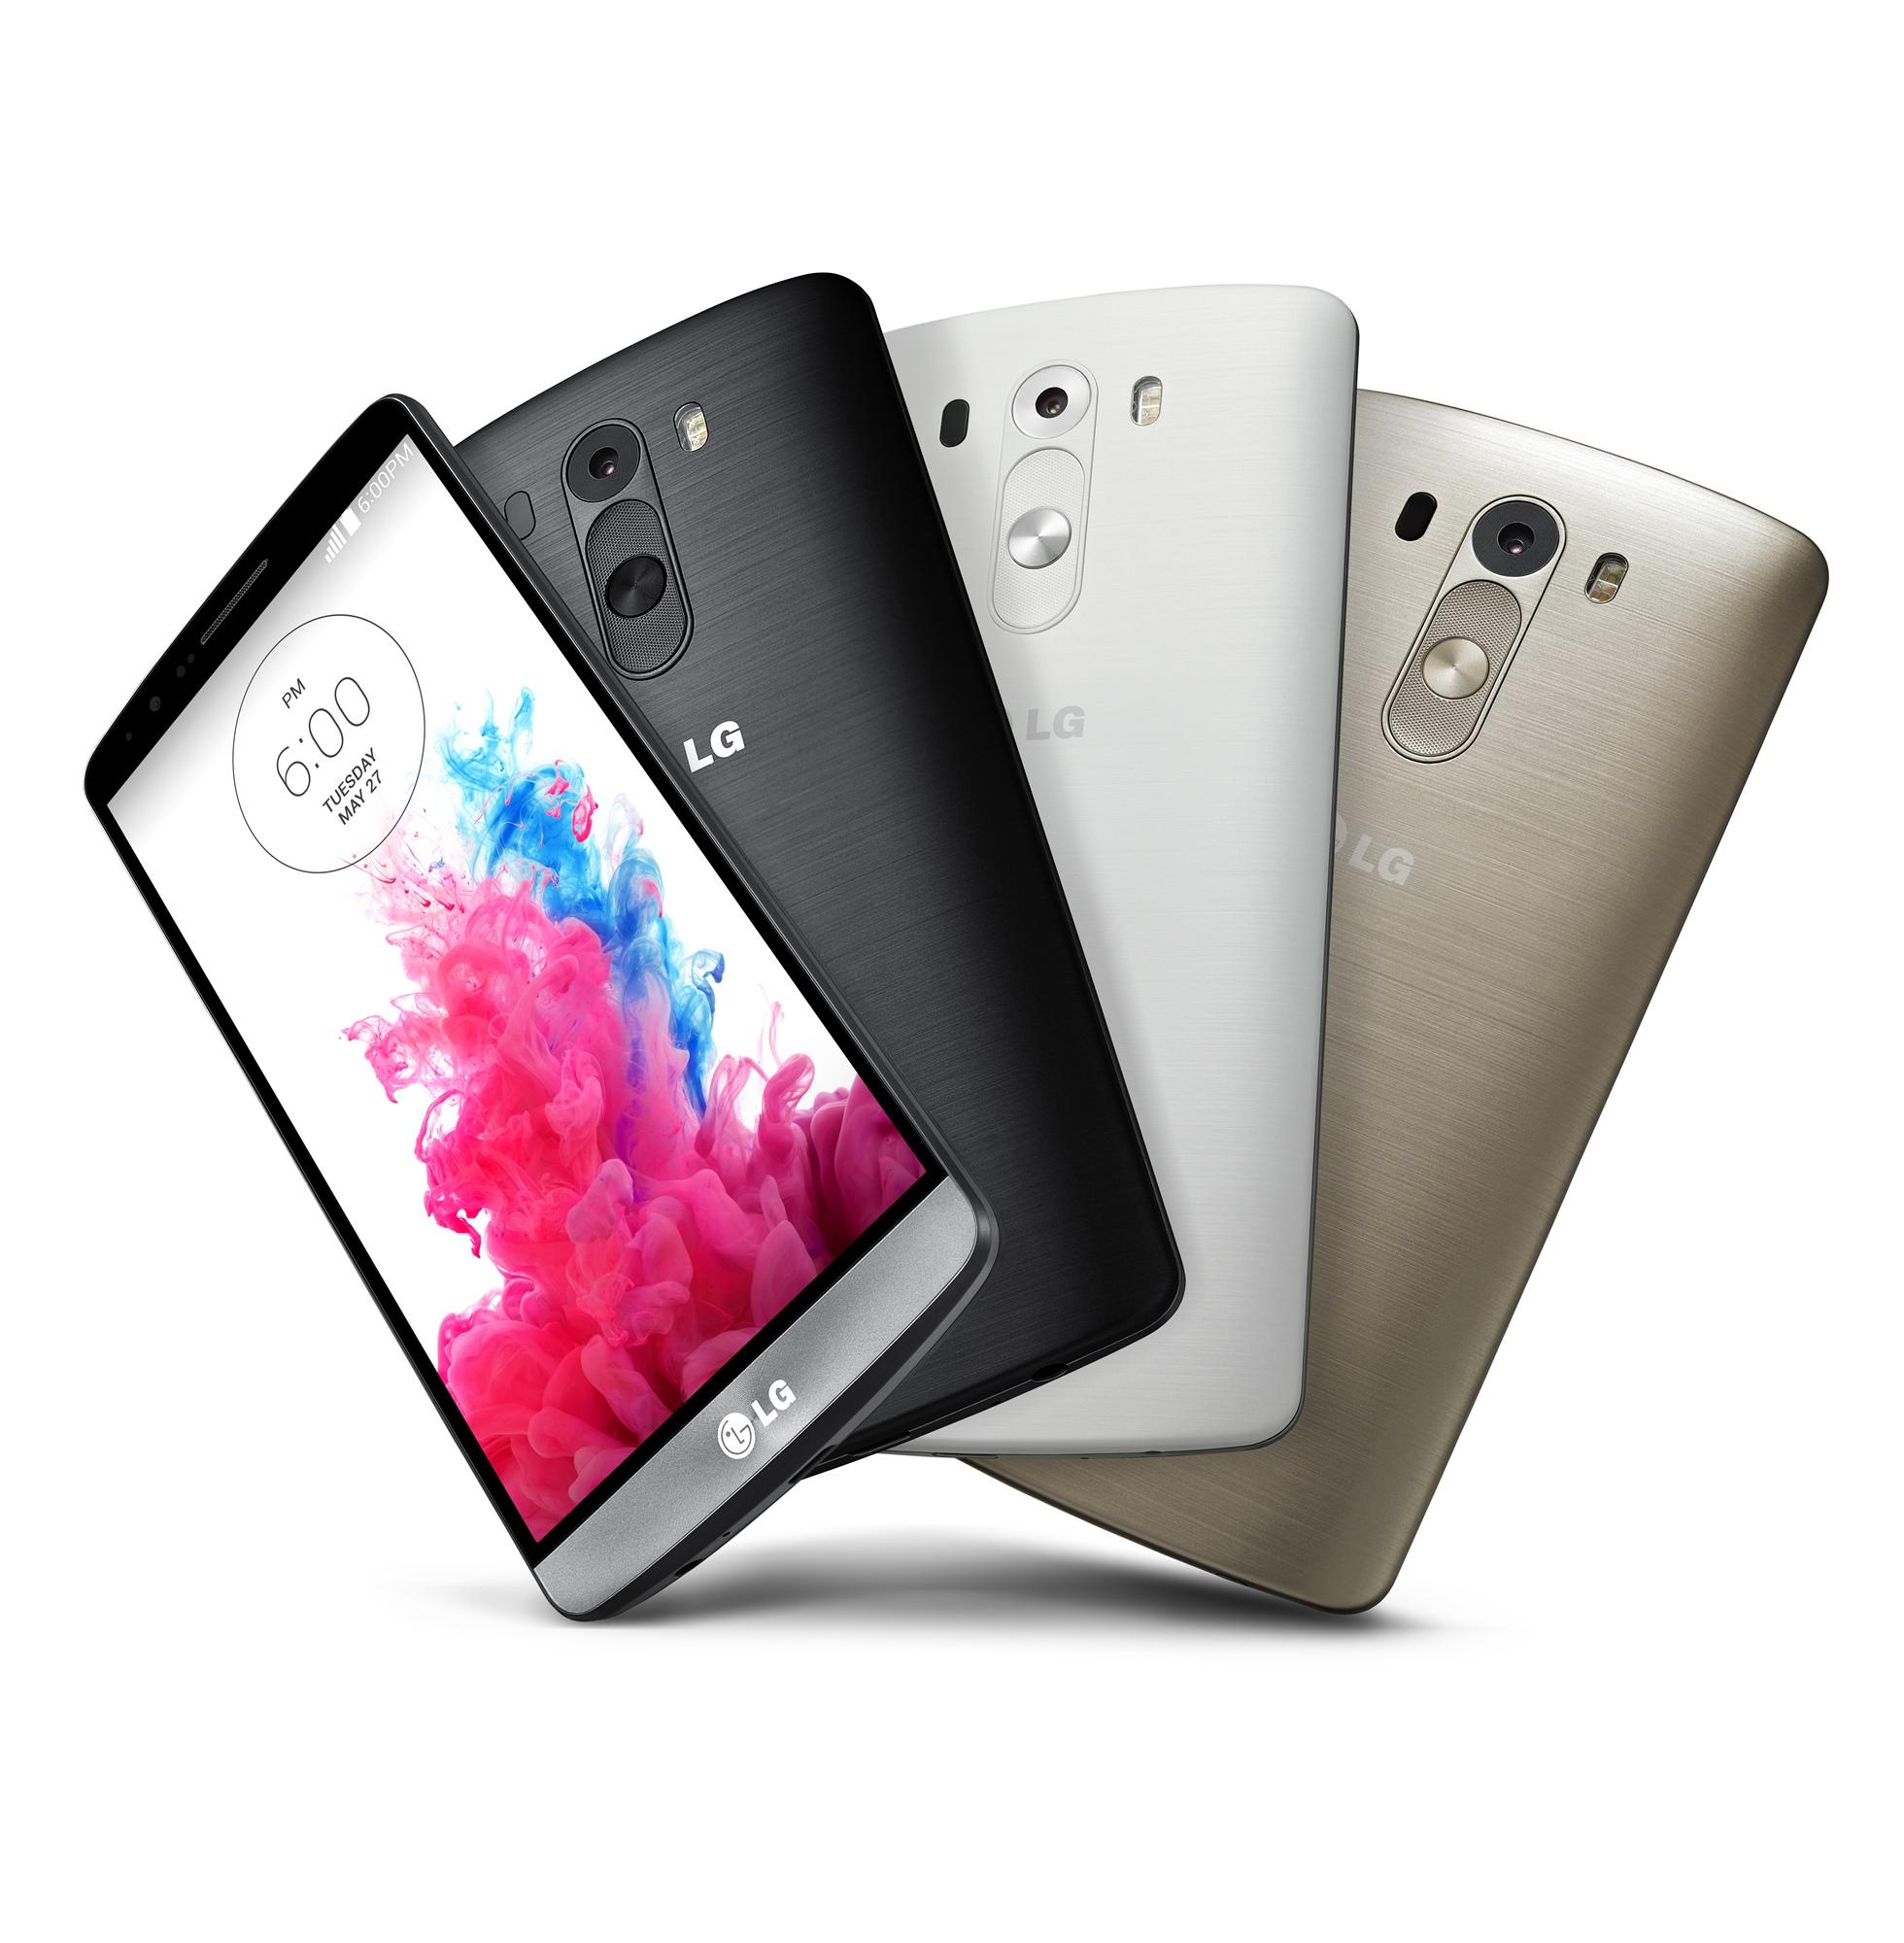 LG G3 4